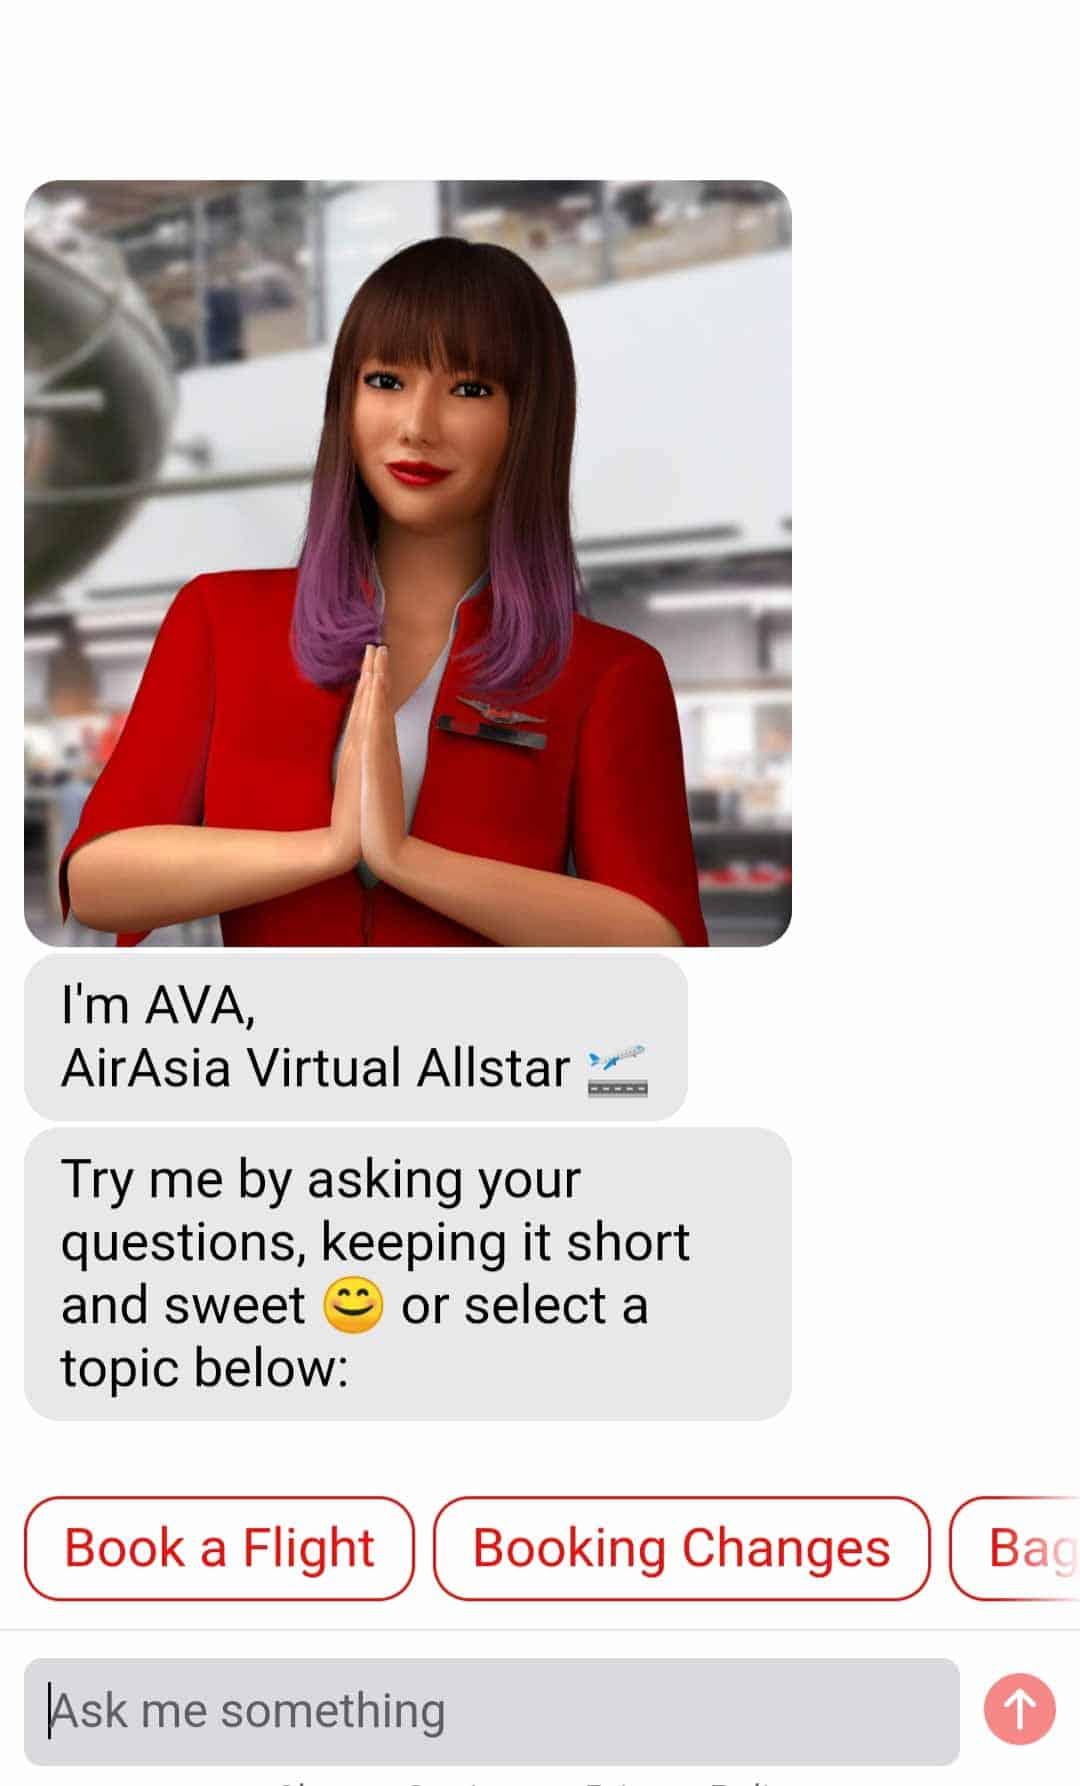 AVA, Airasia's virtual assistant bot